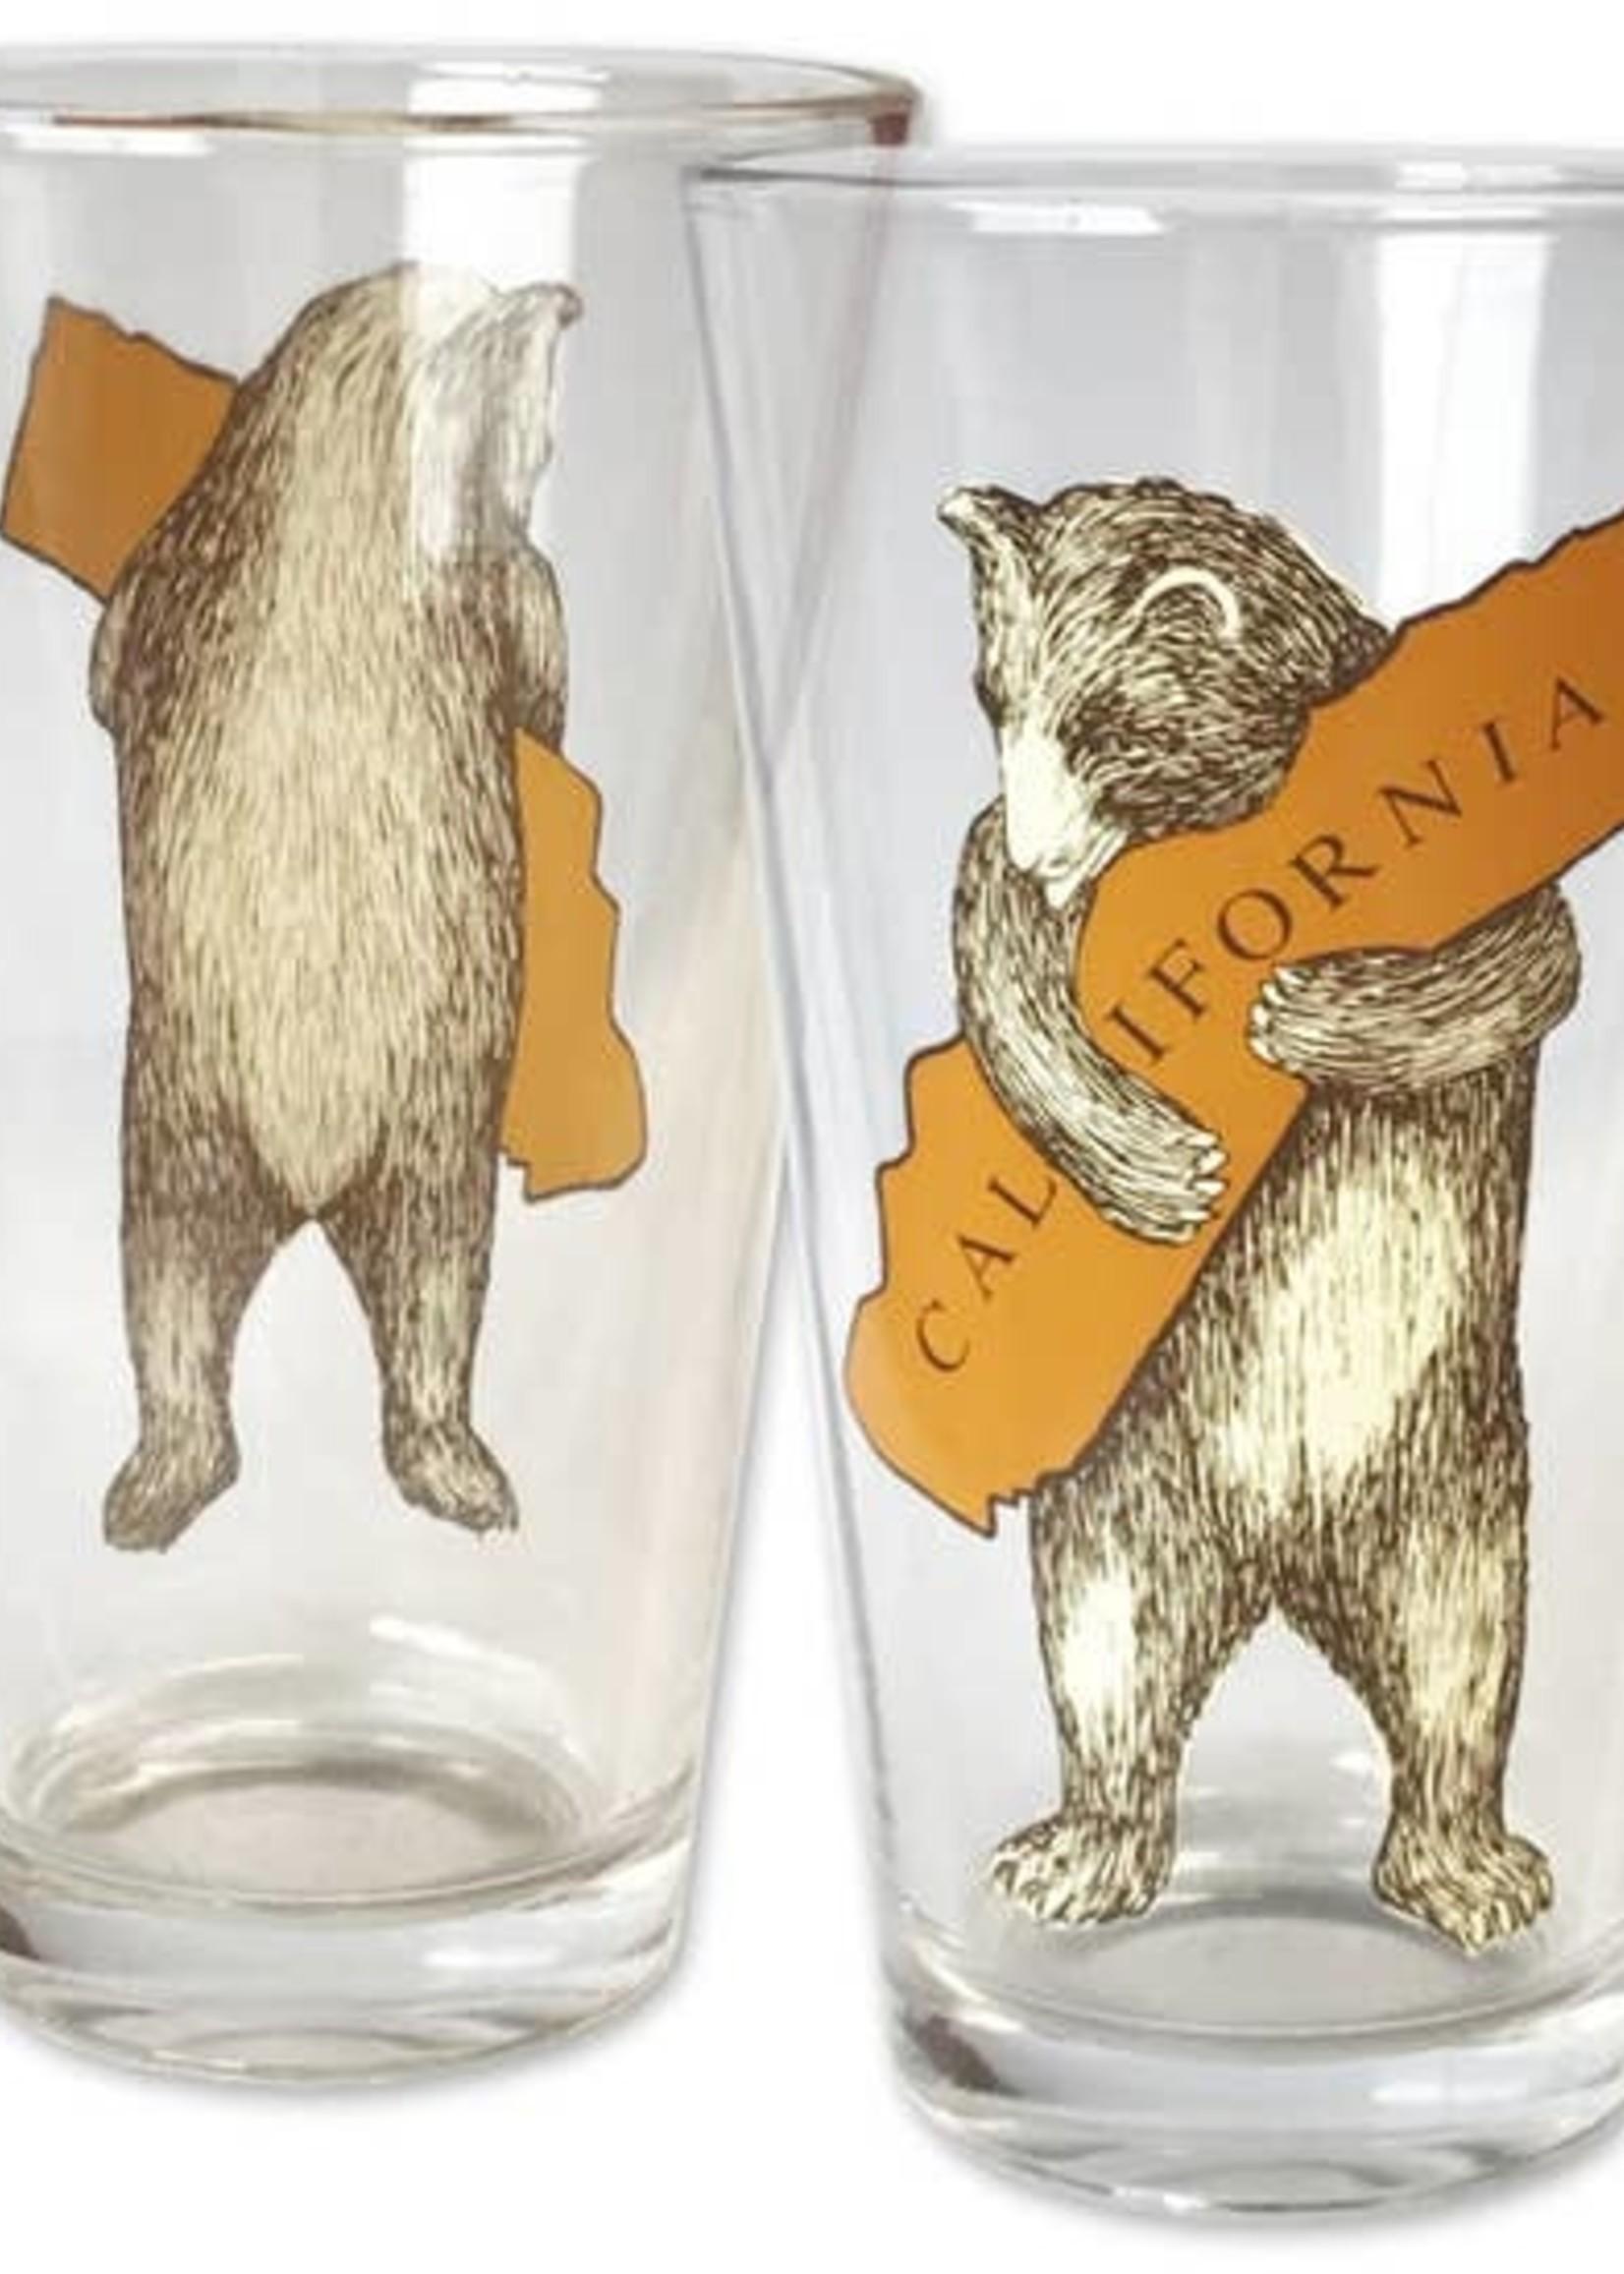 SF MERCANTILE SF MERCANTILE CA BEAR HUG PINT GLASS